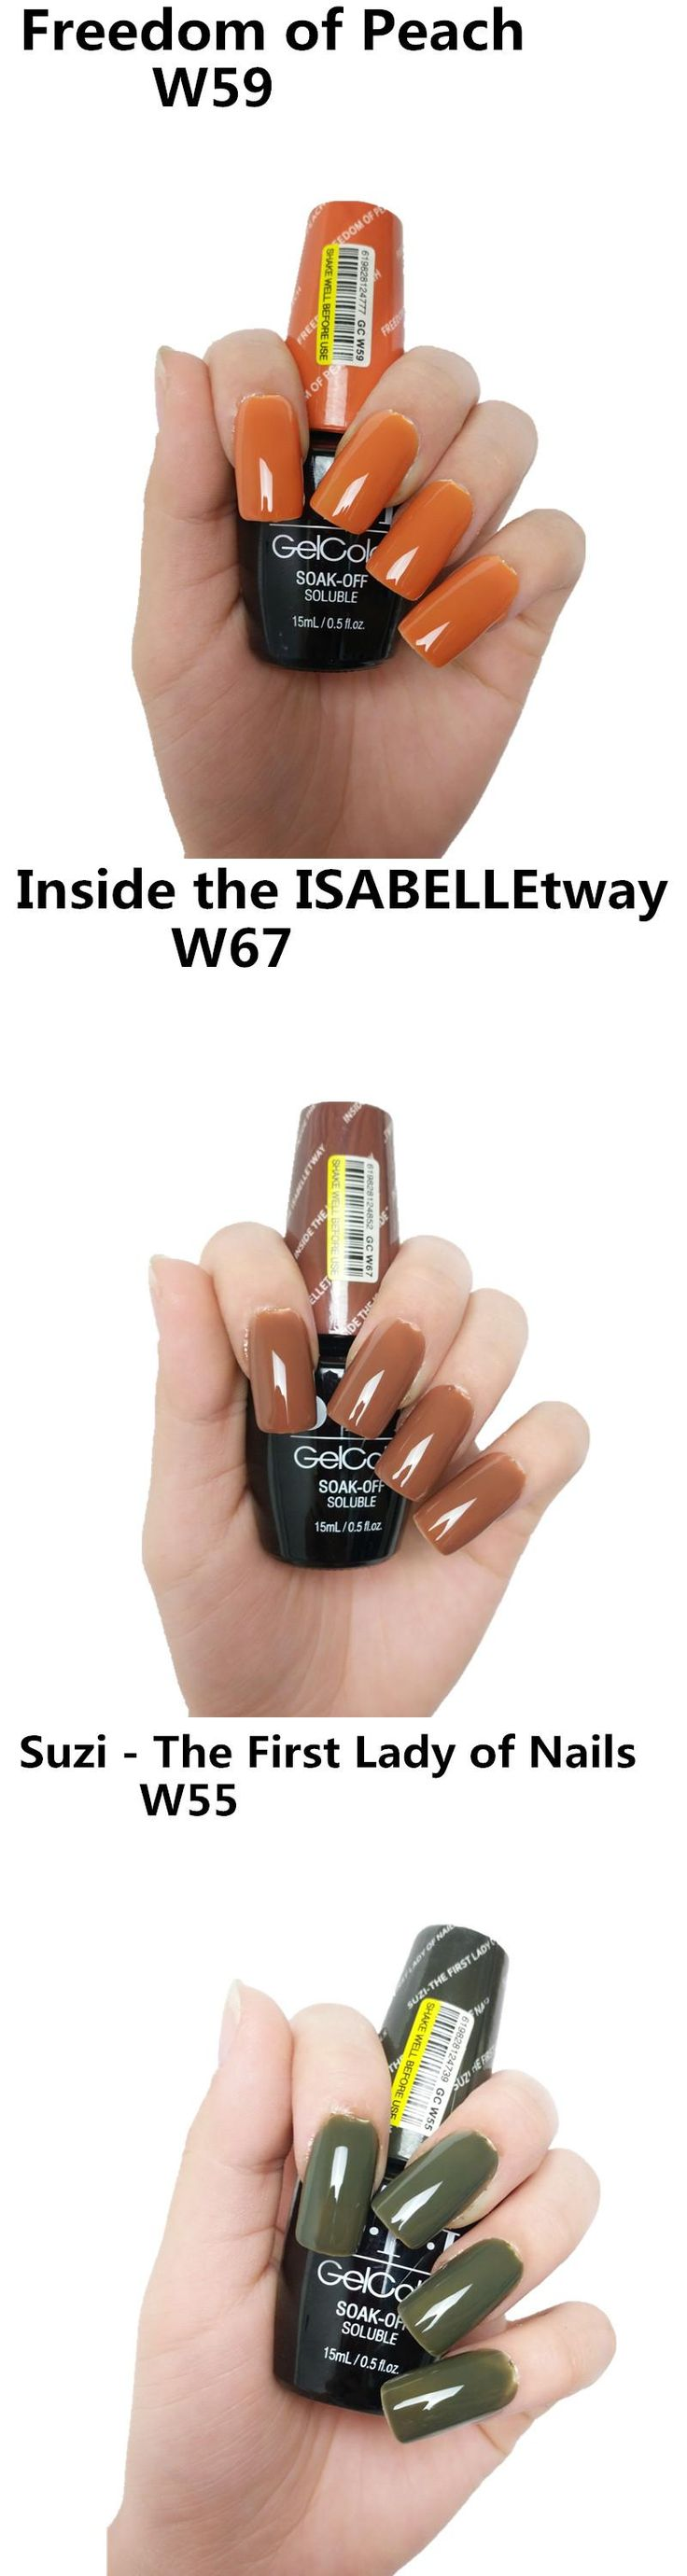 [Visit to Buy] wopie260 COLOR 15ml Nail Gel polish UV LED Gel Polish opie color Vernis Semi Permanent lasting shine Uv gel nail polish Nail Art #Advertisement